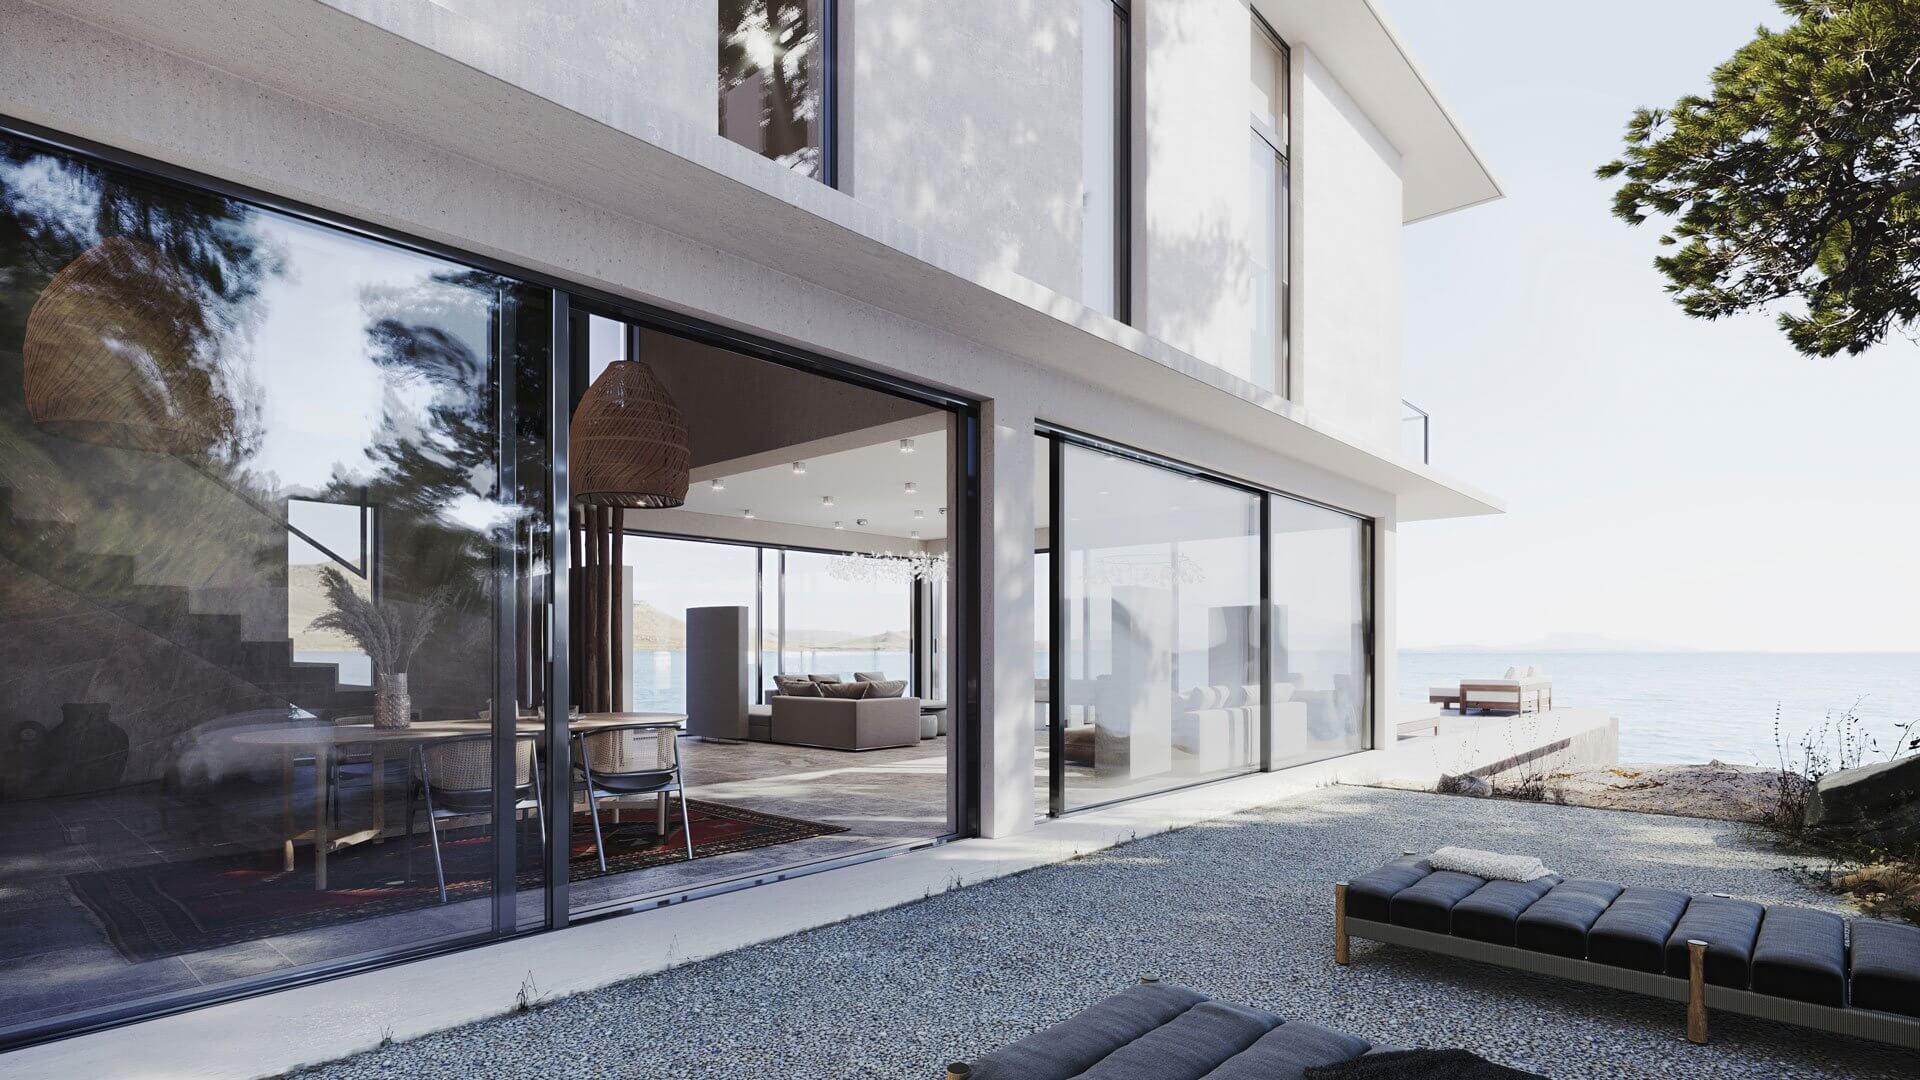 3D Exterior Visualization Of A Seaside Villa